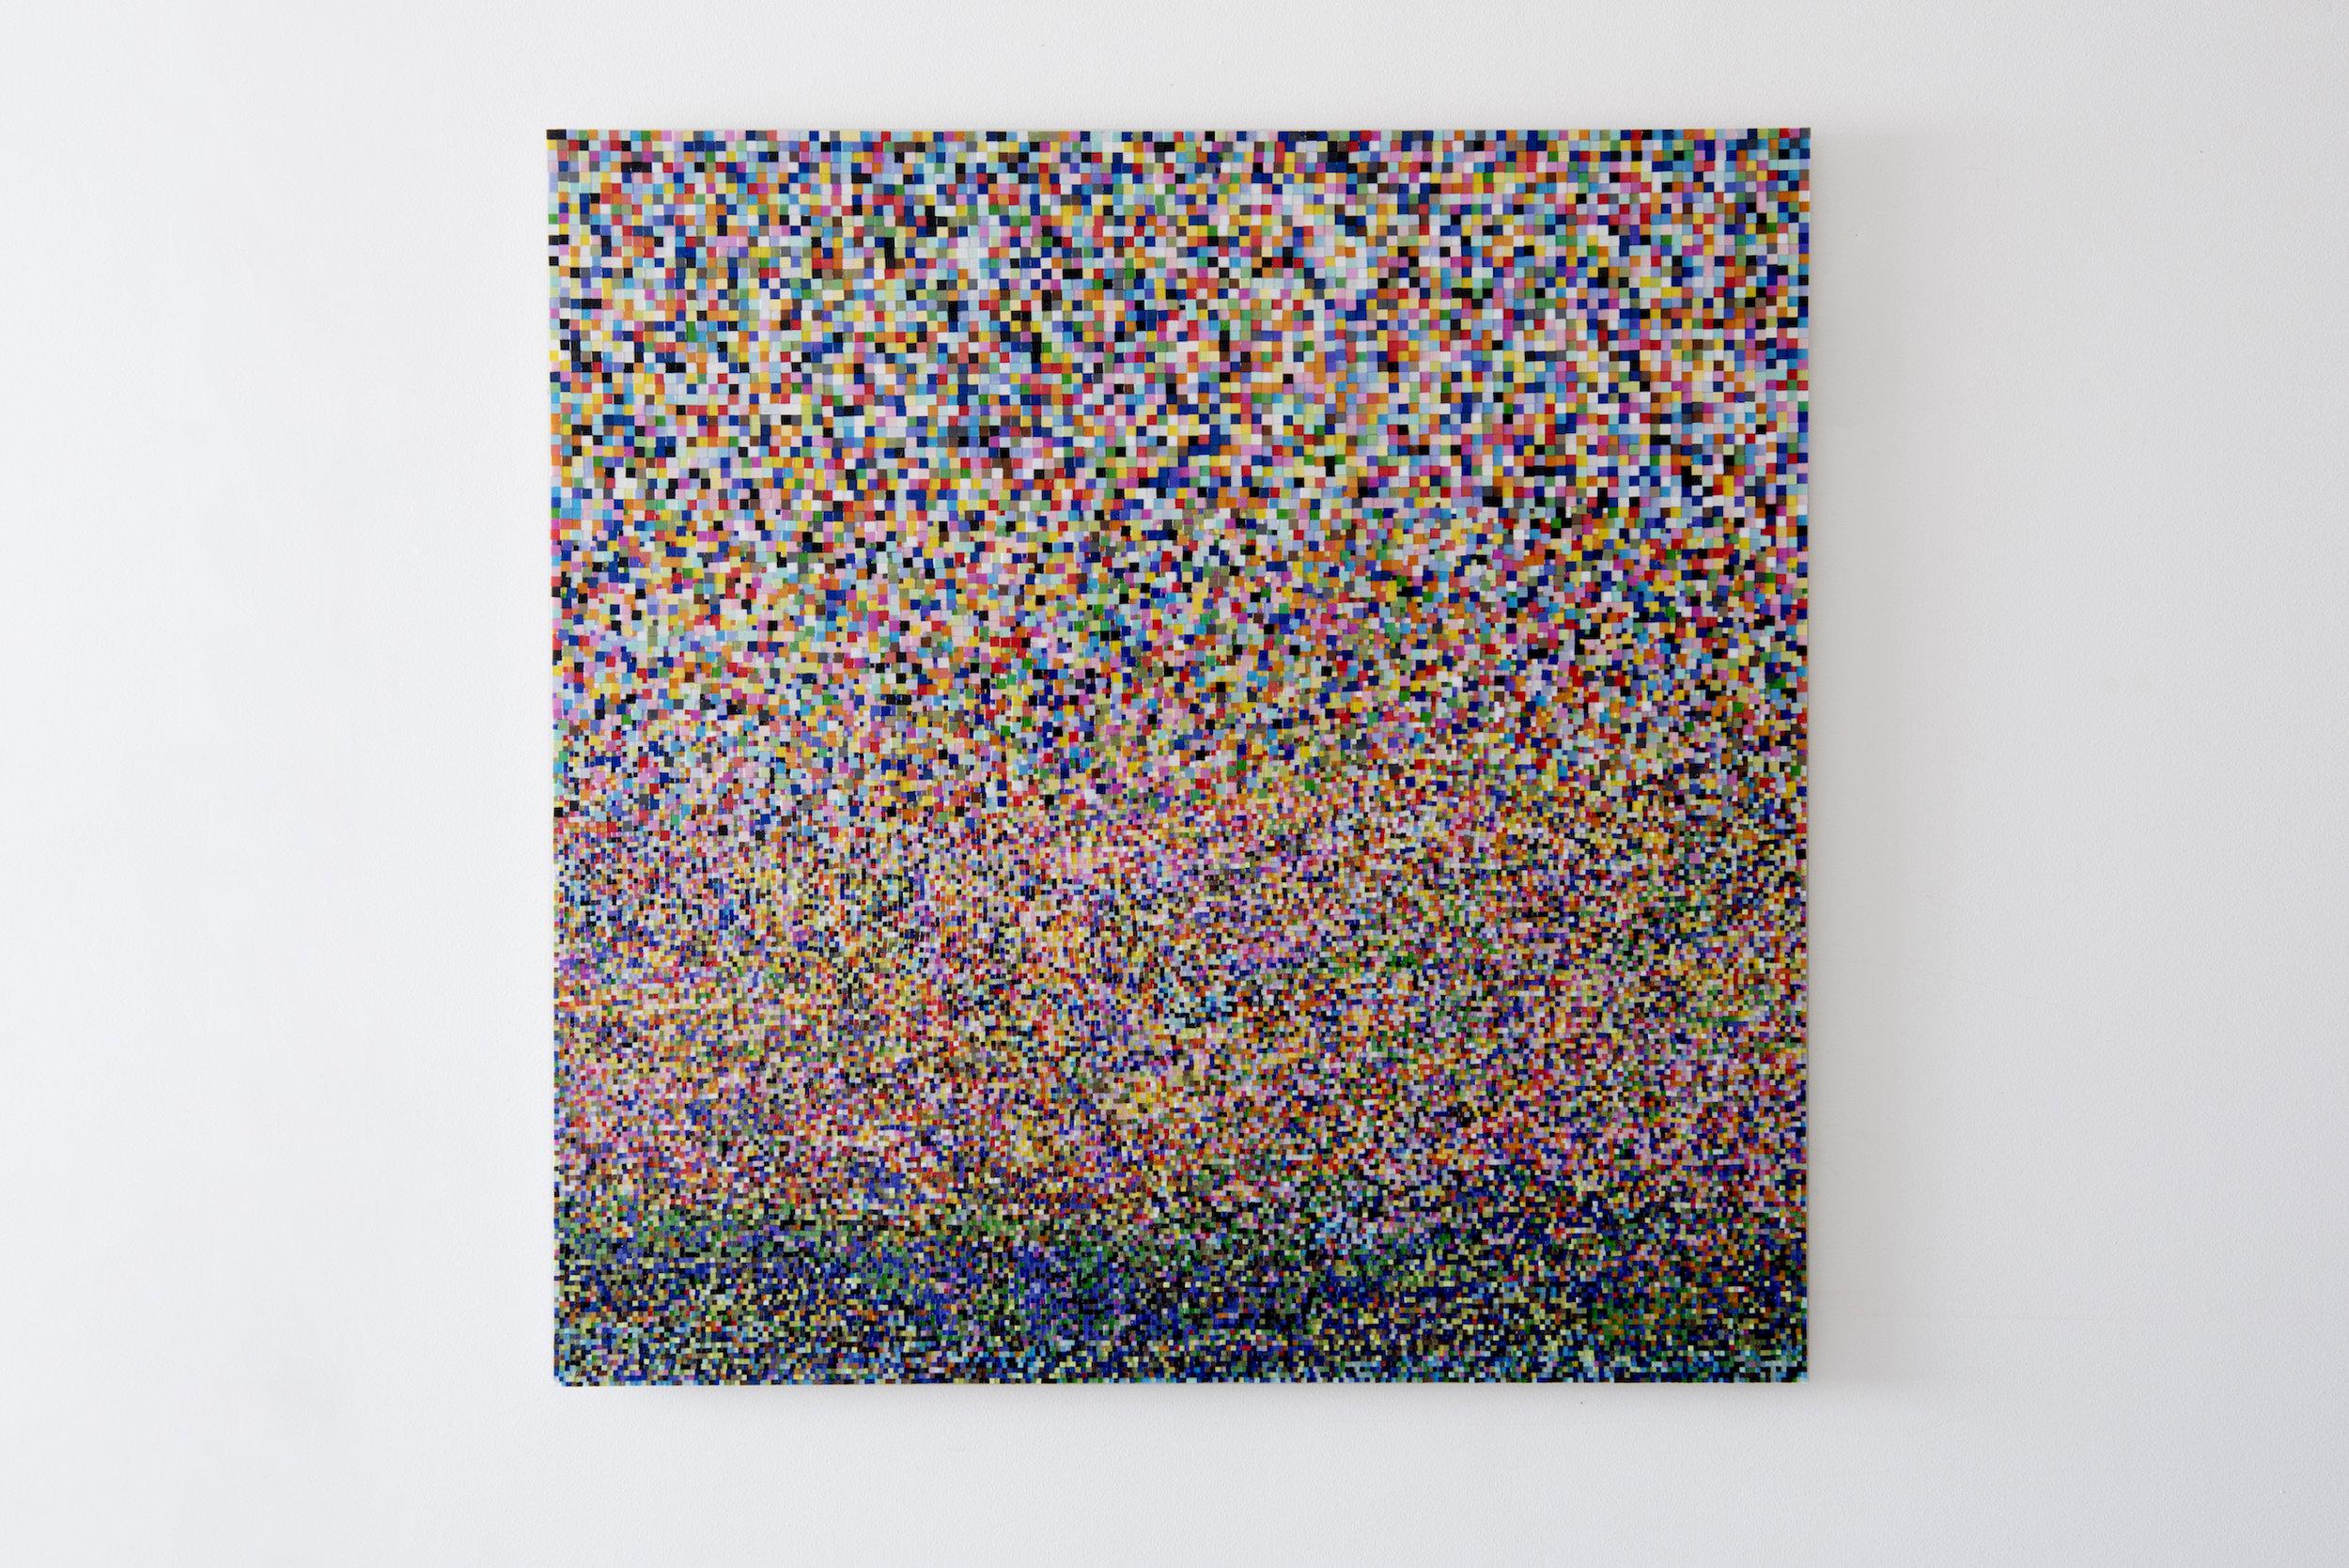 Mosaic Study III (continued) 2017 Mosaic, MDF 122x122cm Private Collection  Photo: Jan Inge Haga